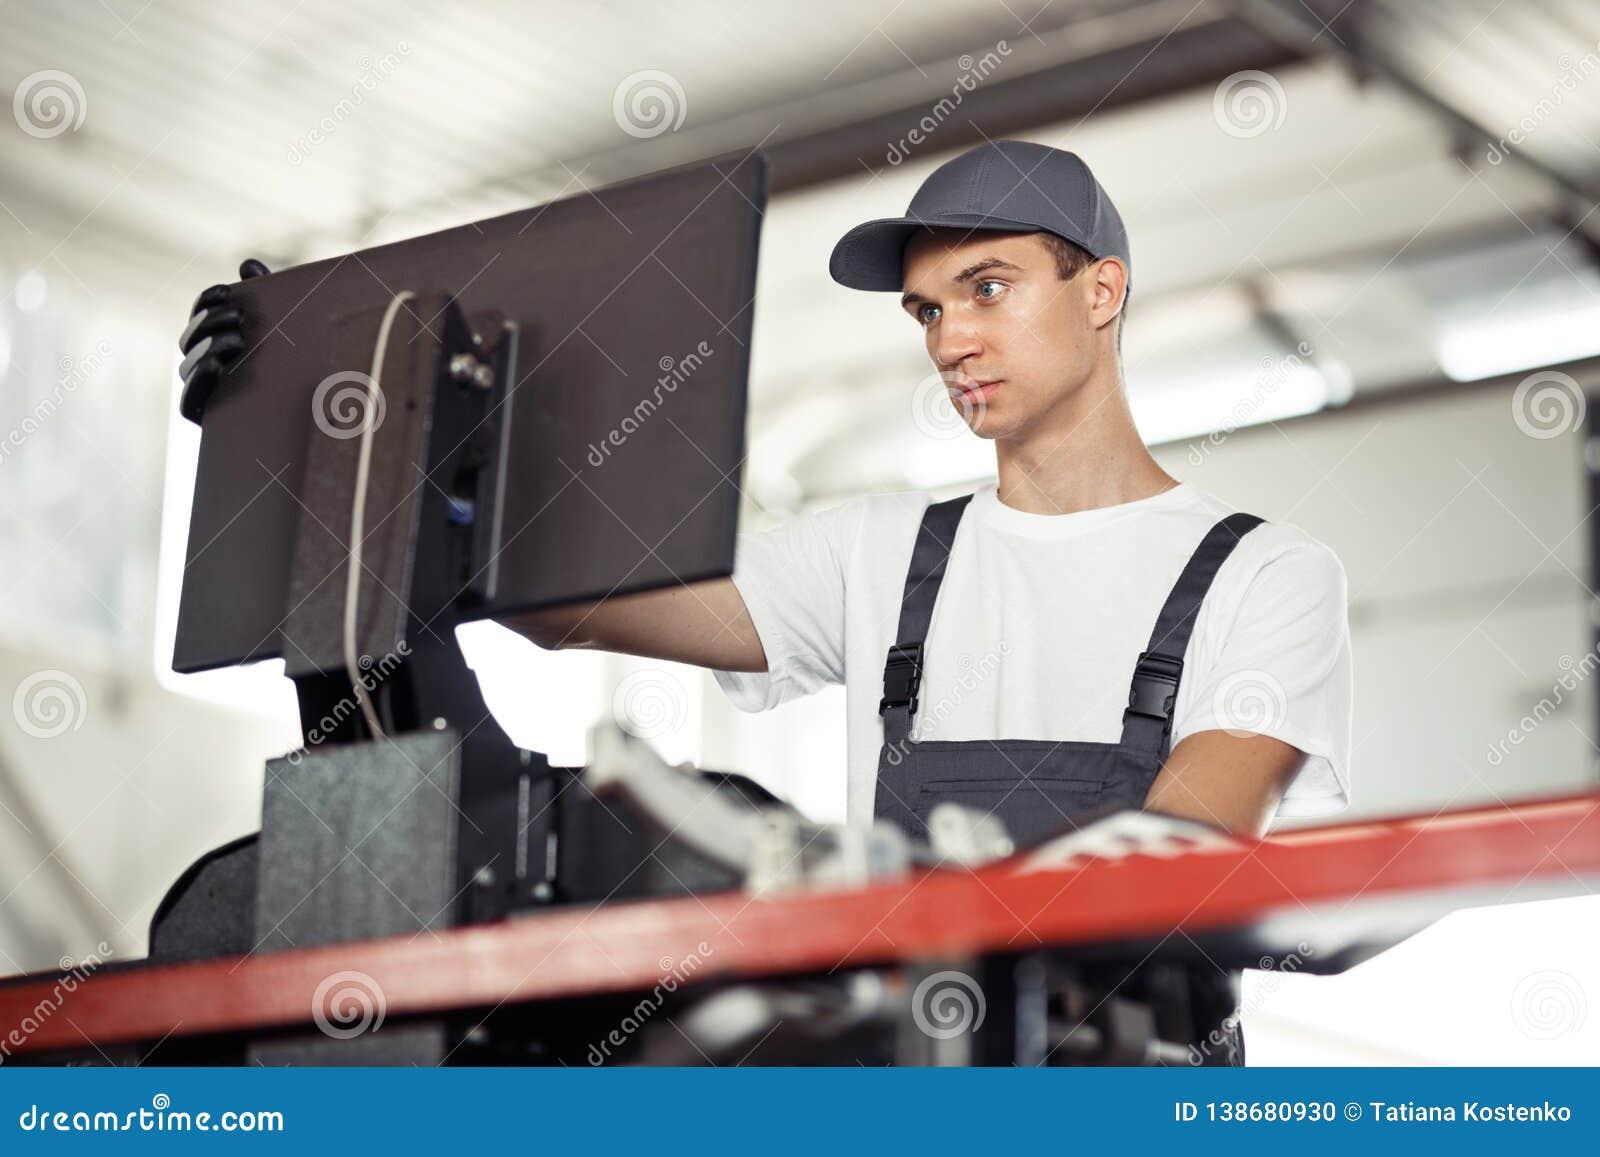 Un mecánico de ojos azules joven está comprobando un coche en un servicio del coche usando un ordenador